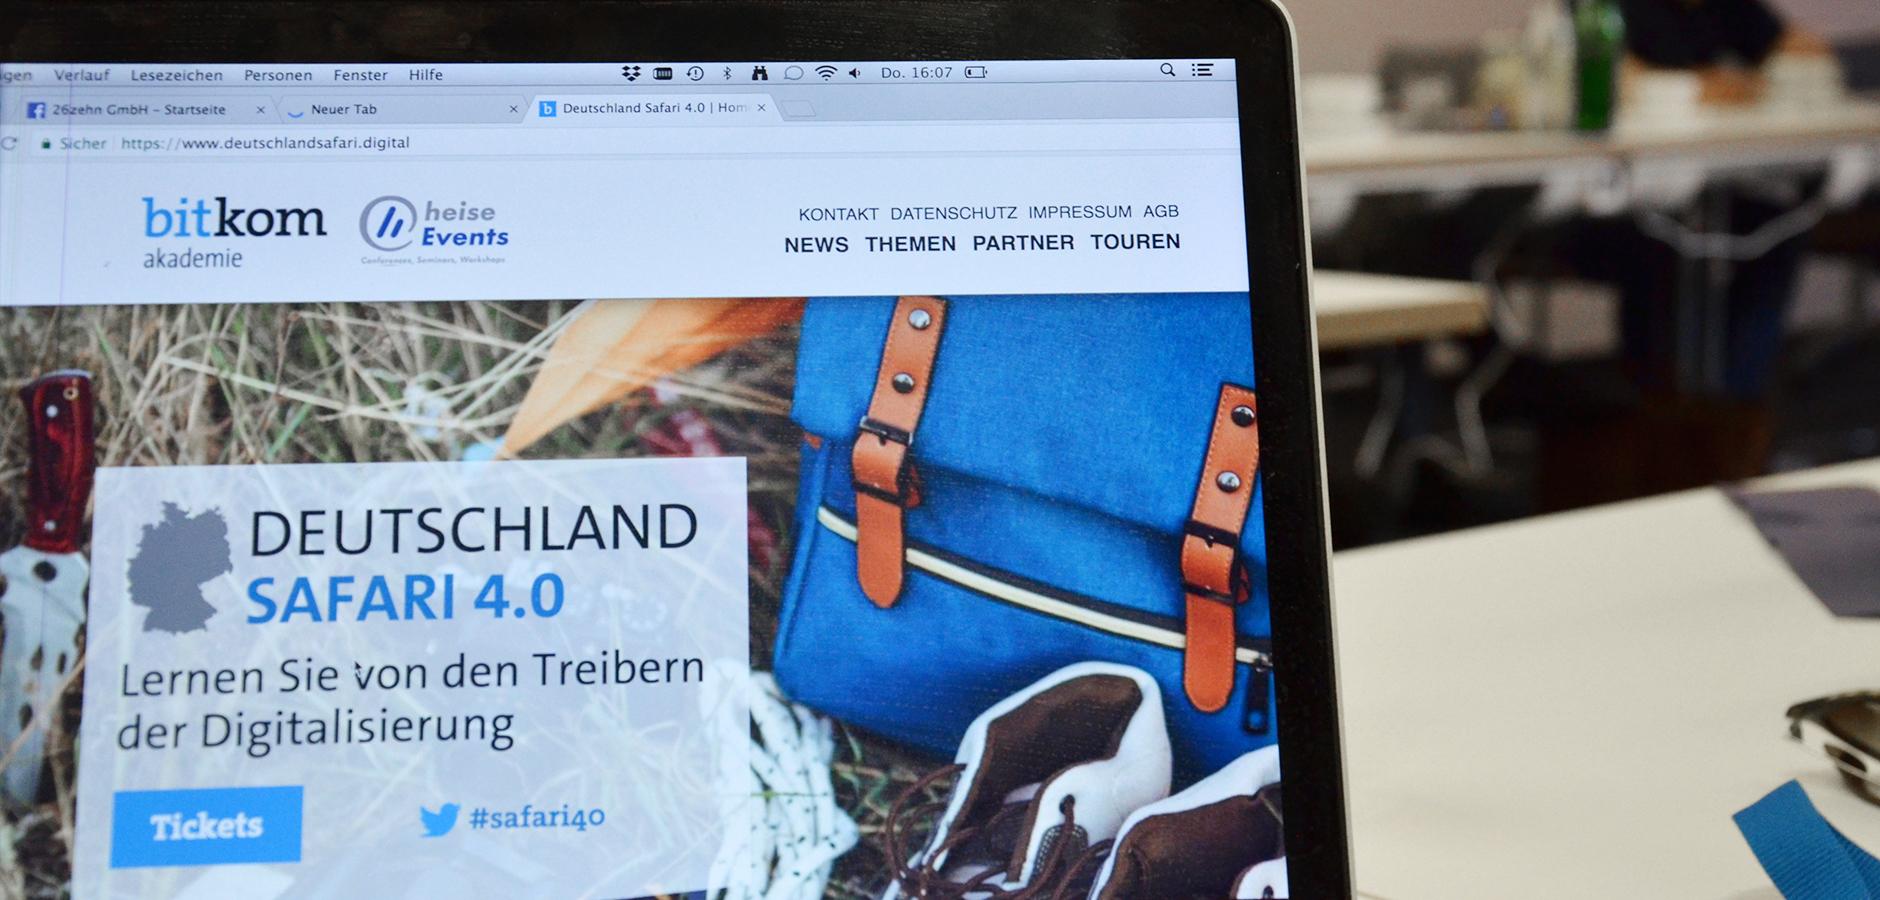 BITKOM AKADEMIE - Deutschland Safari 4.0